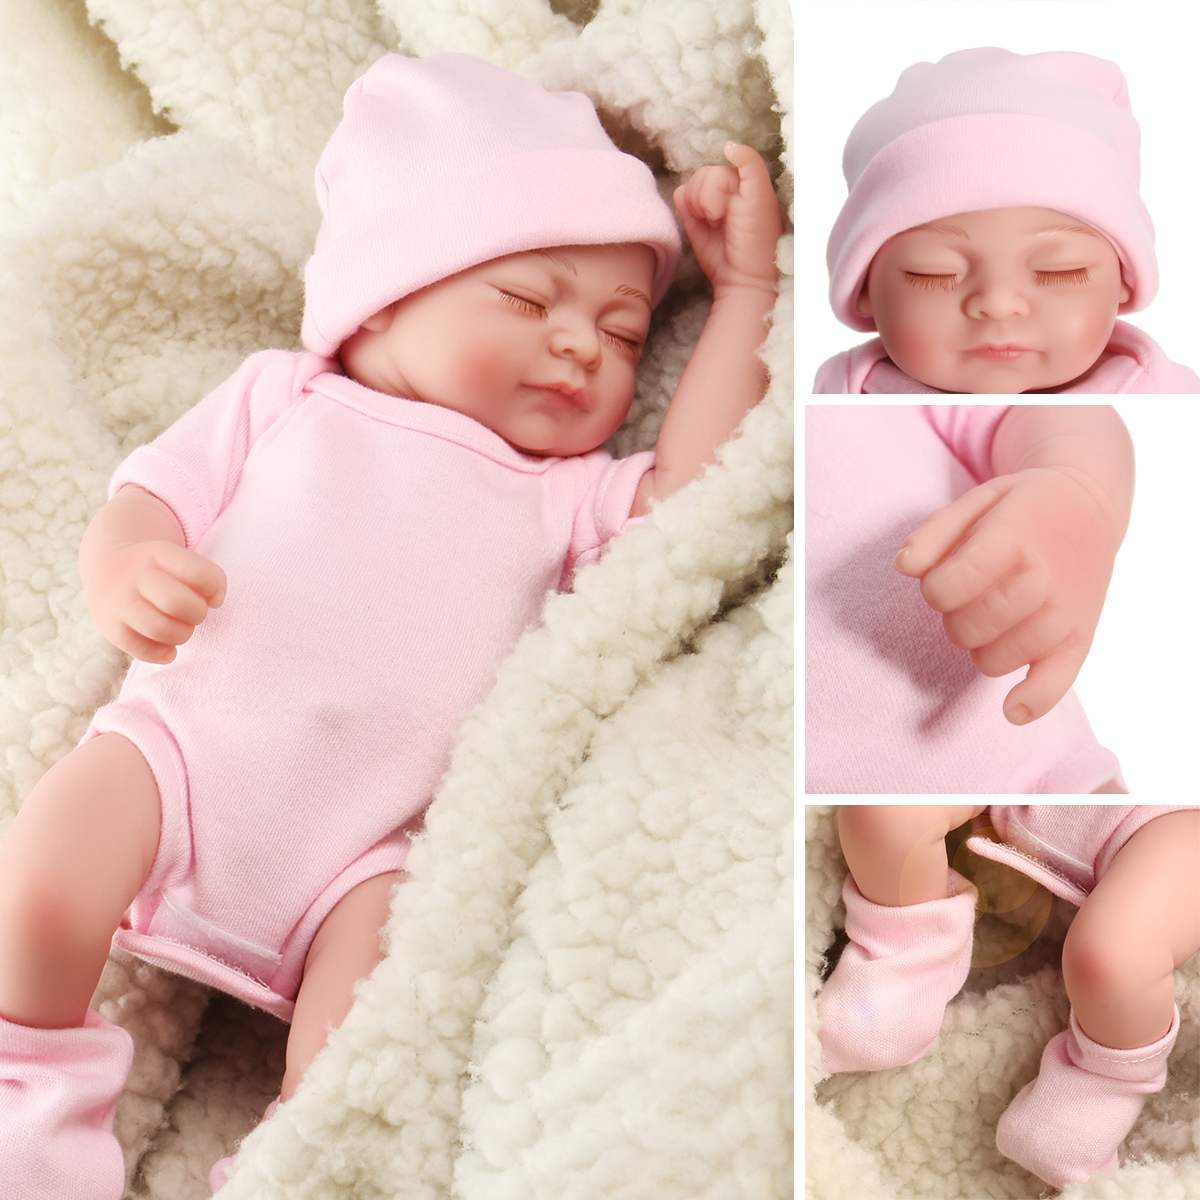 High Quality 11'' Realistic Lifelike Realike Alive Newborn Reborn Babies Silicone Vinyl... by